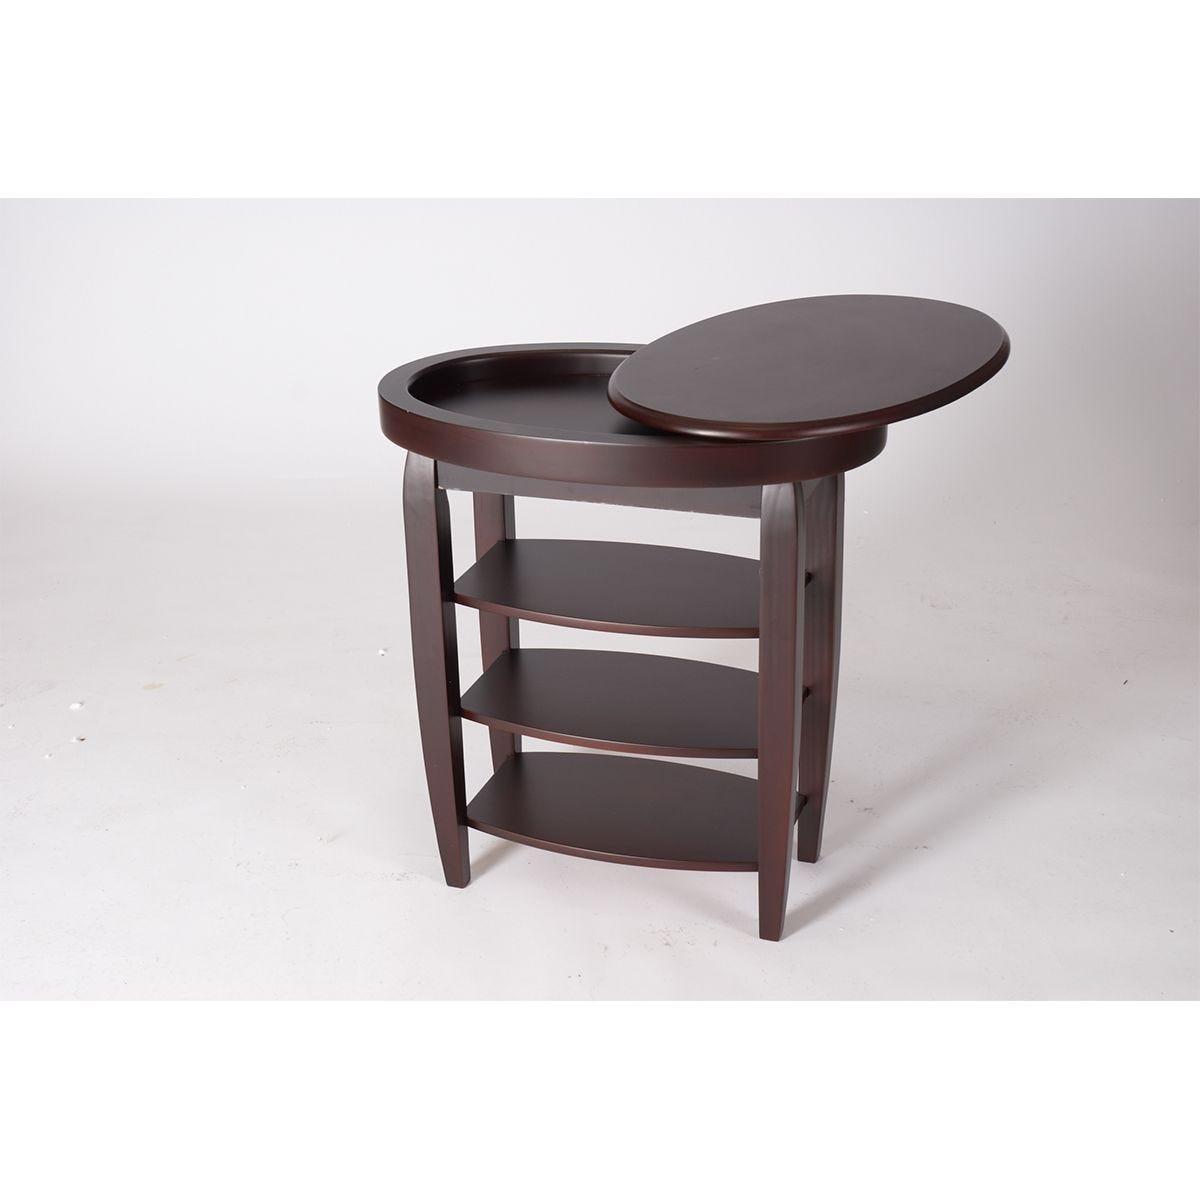 Gablemere Swivel Top Table - Mahogany